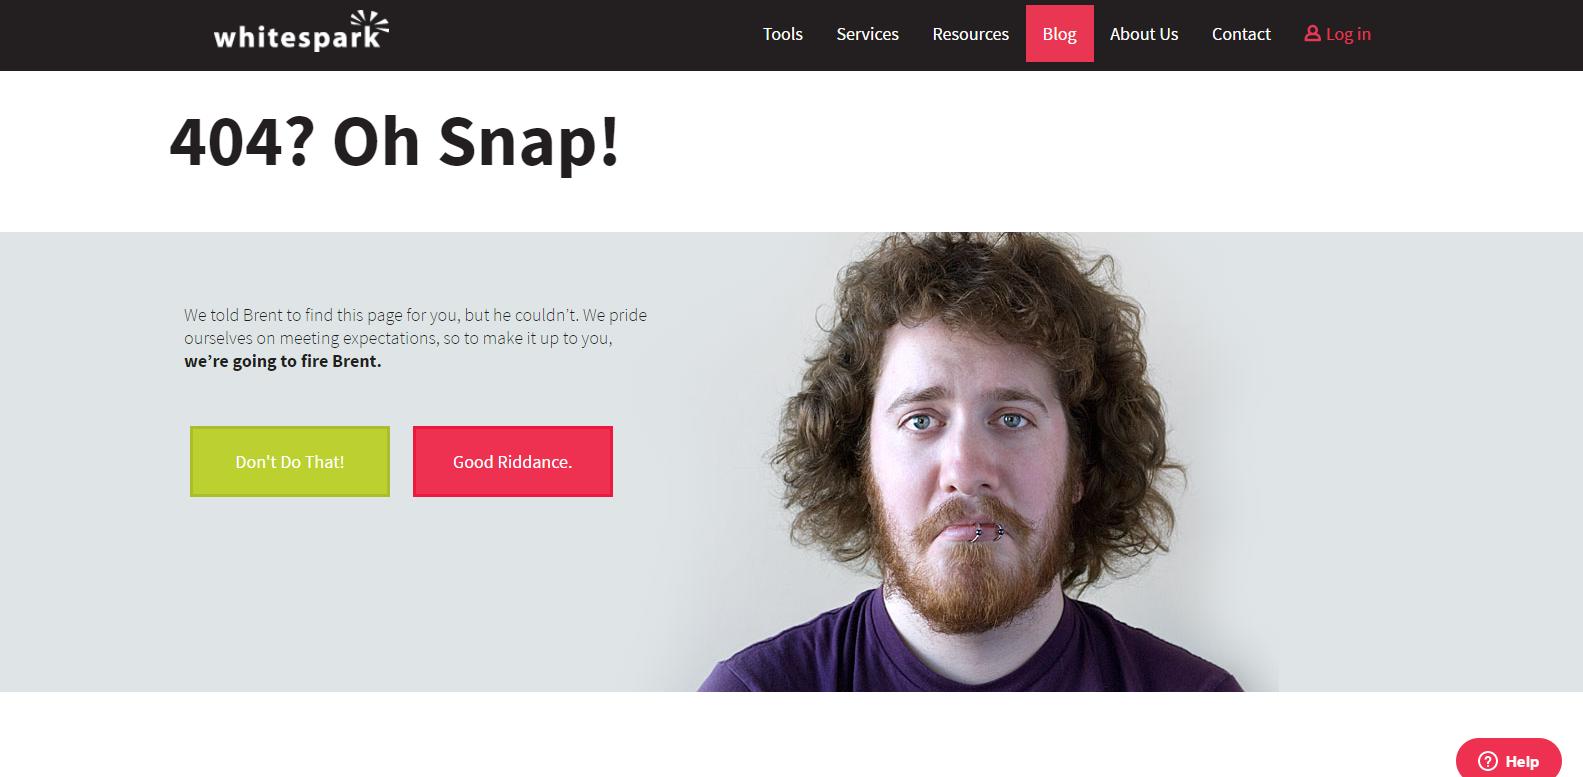 Whitespark's 404 Page